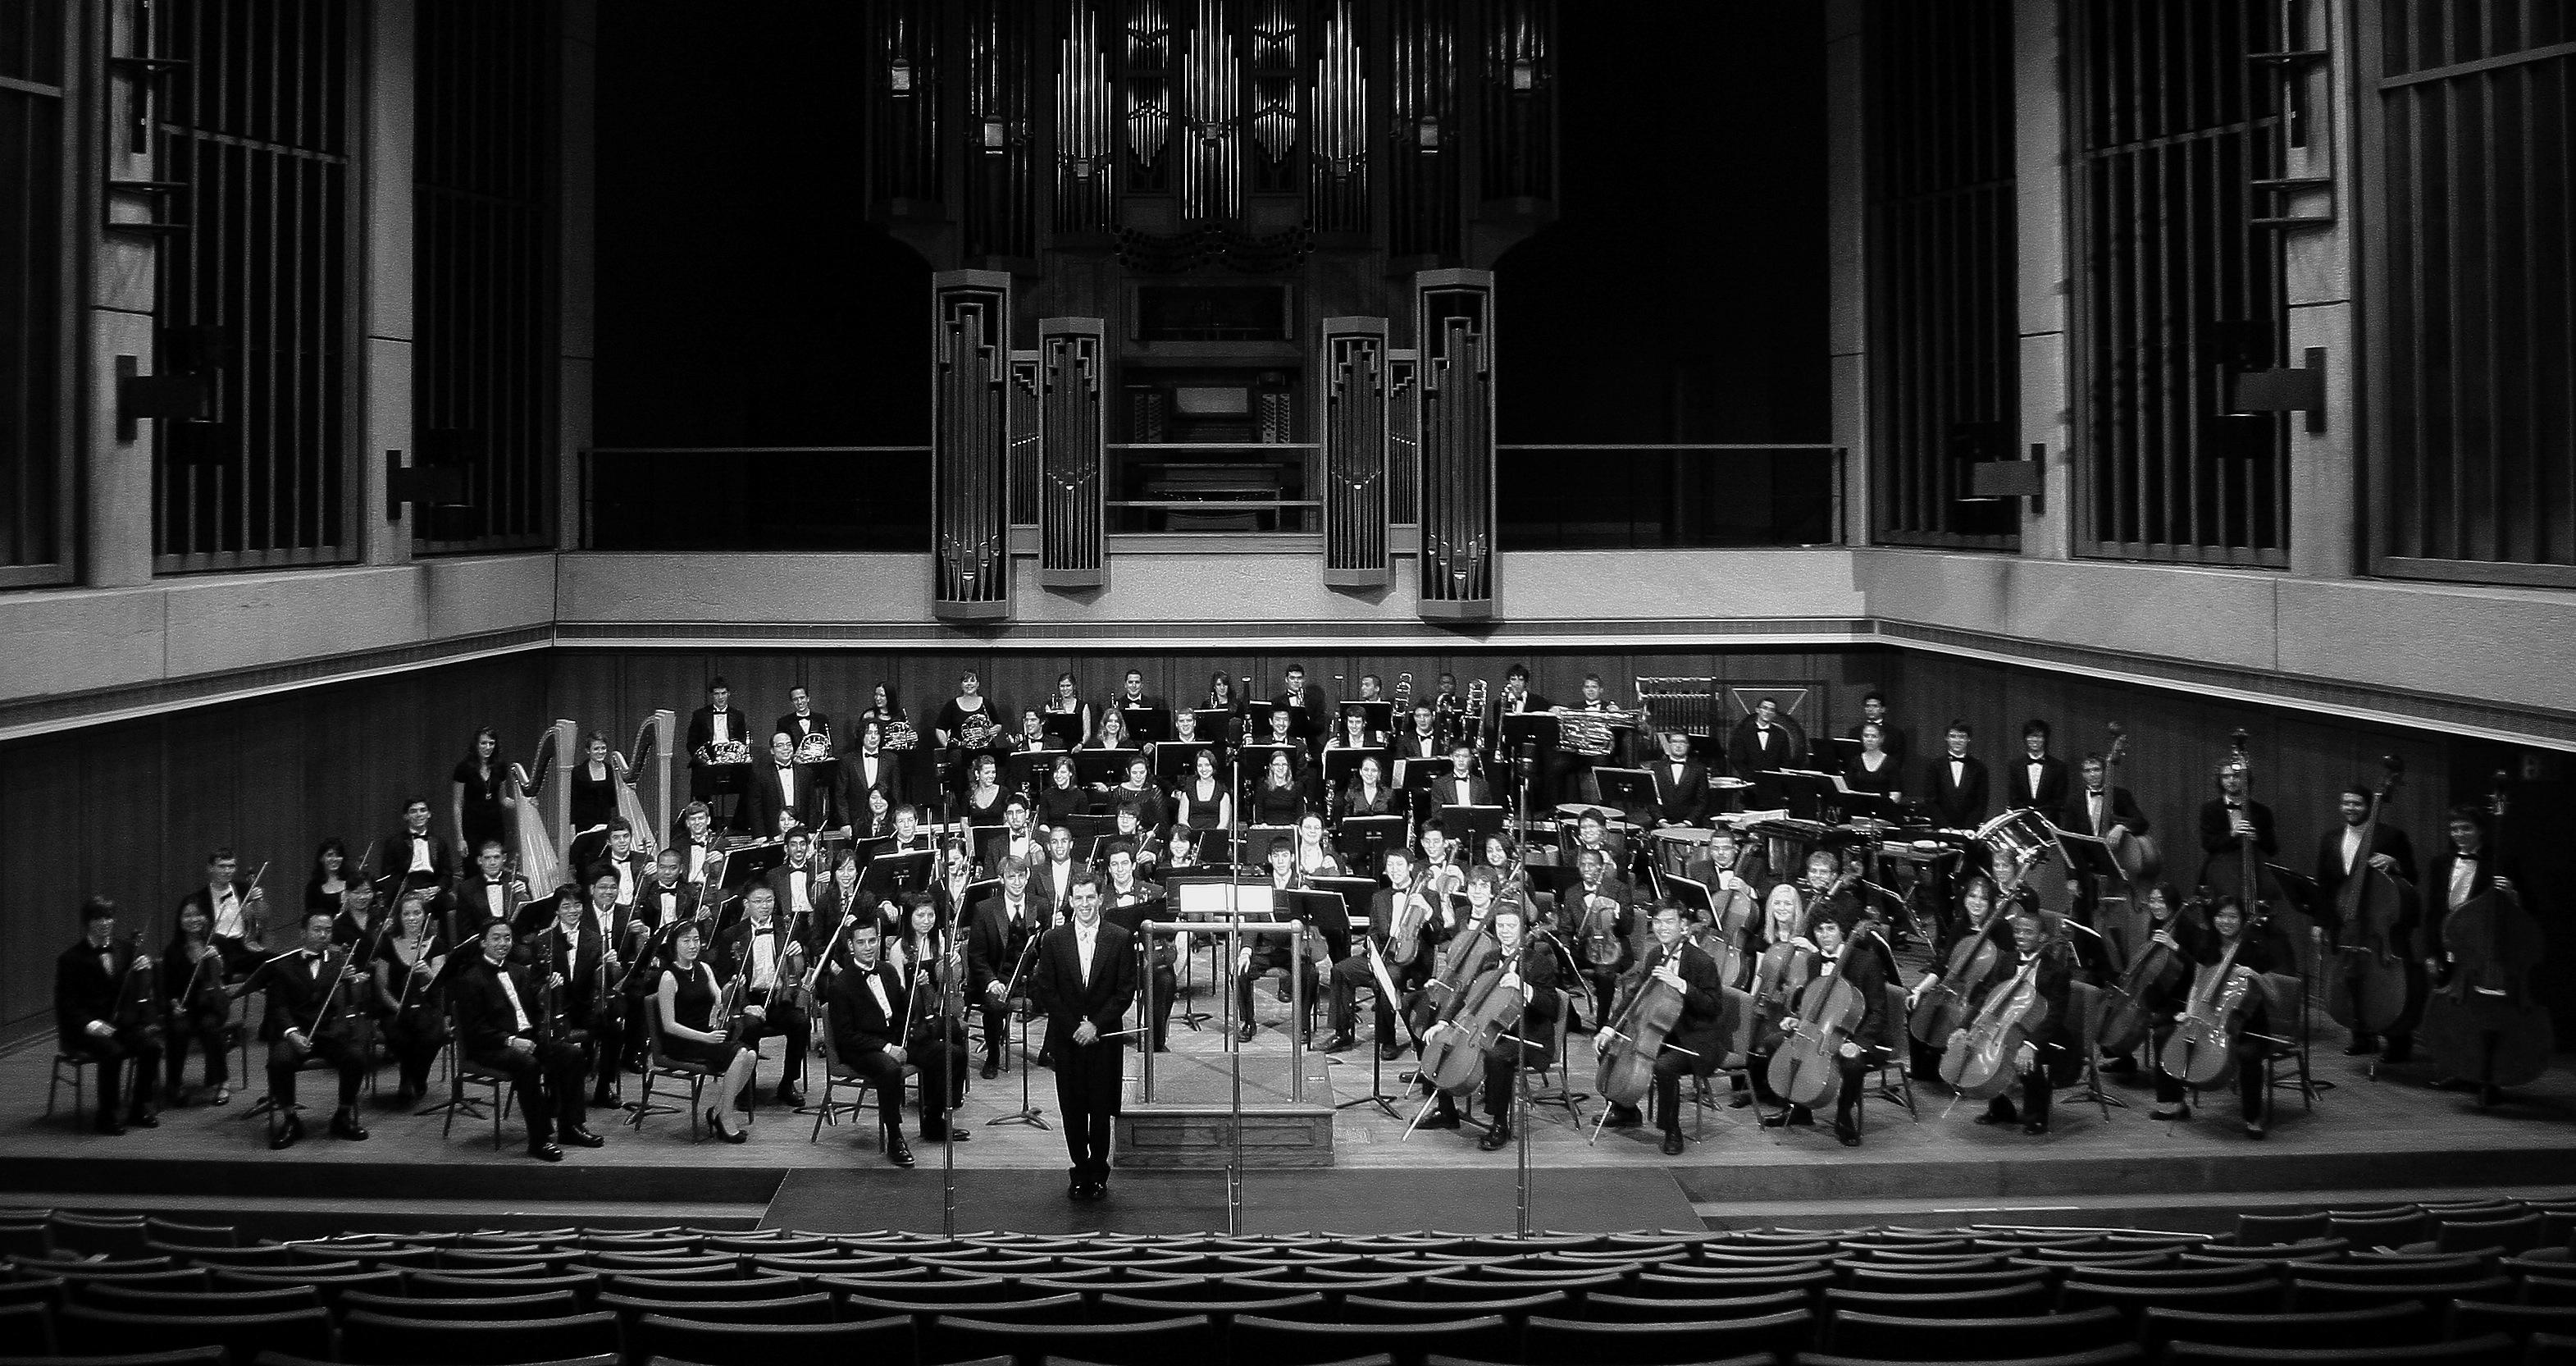 Richard McKay, Conductor, University Orchestra, University of Texas at Austin